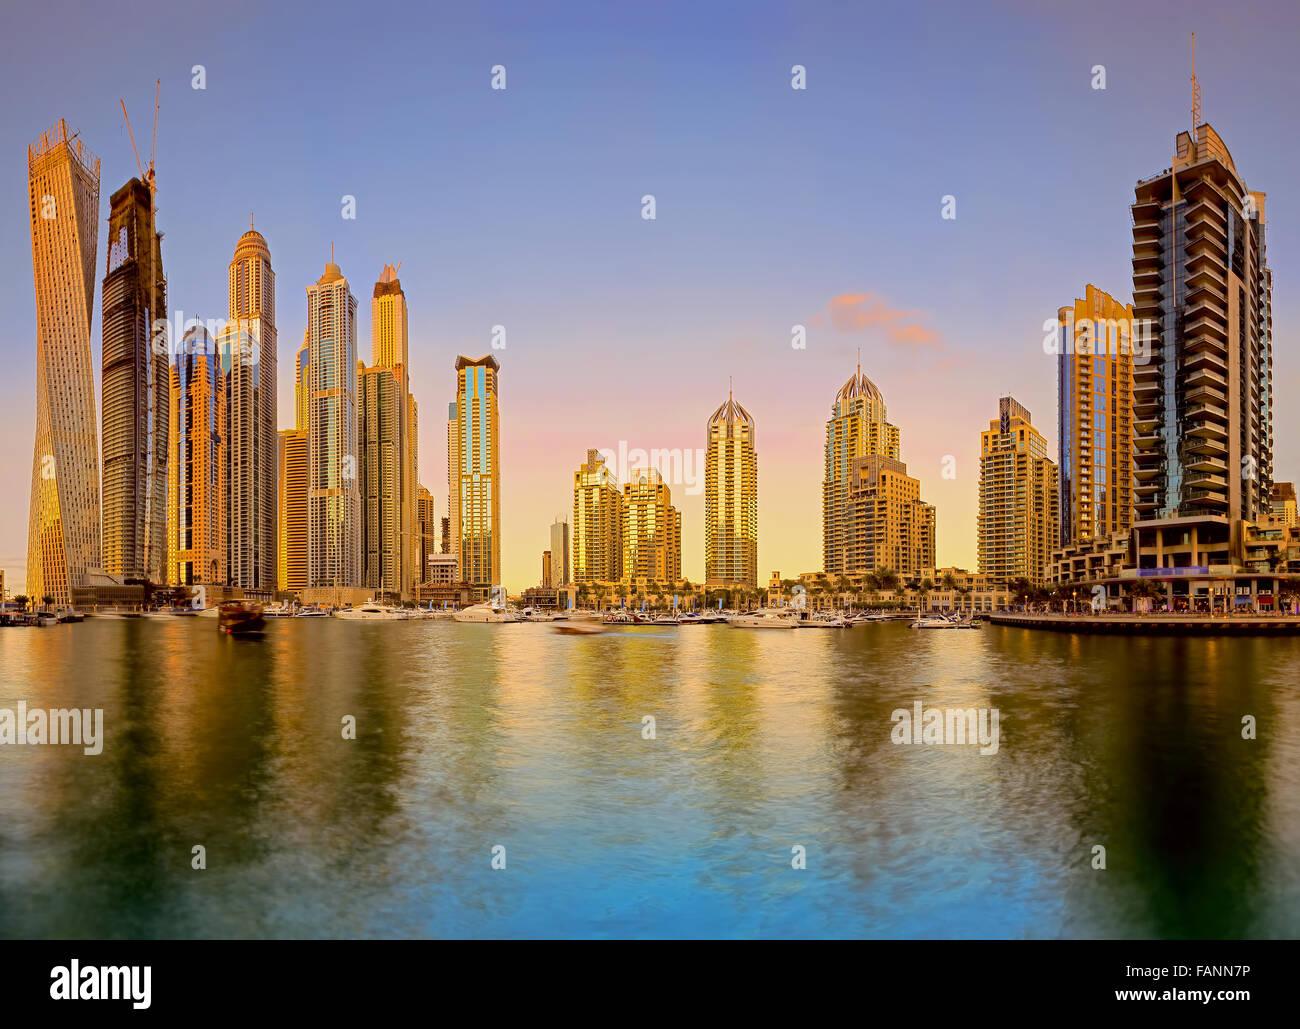 Sunset Skyline picture Shot en Dubai Marina Imagen De Stock